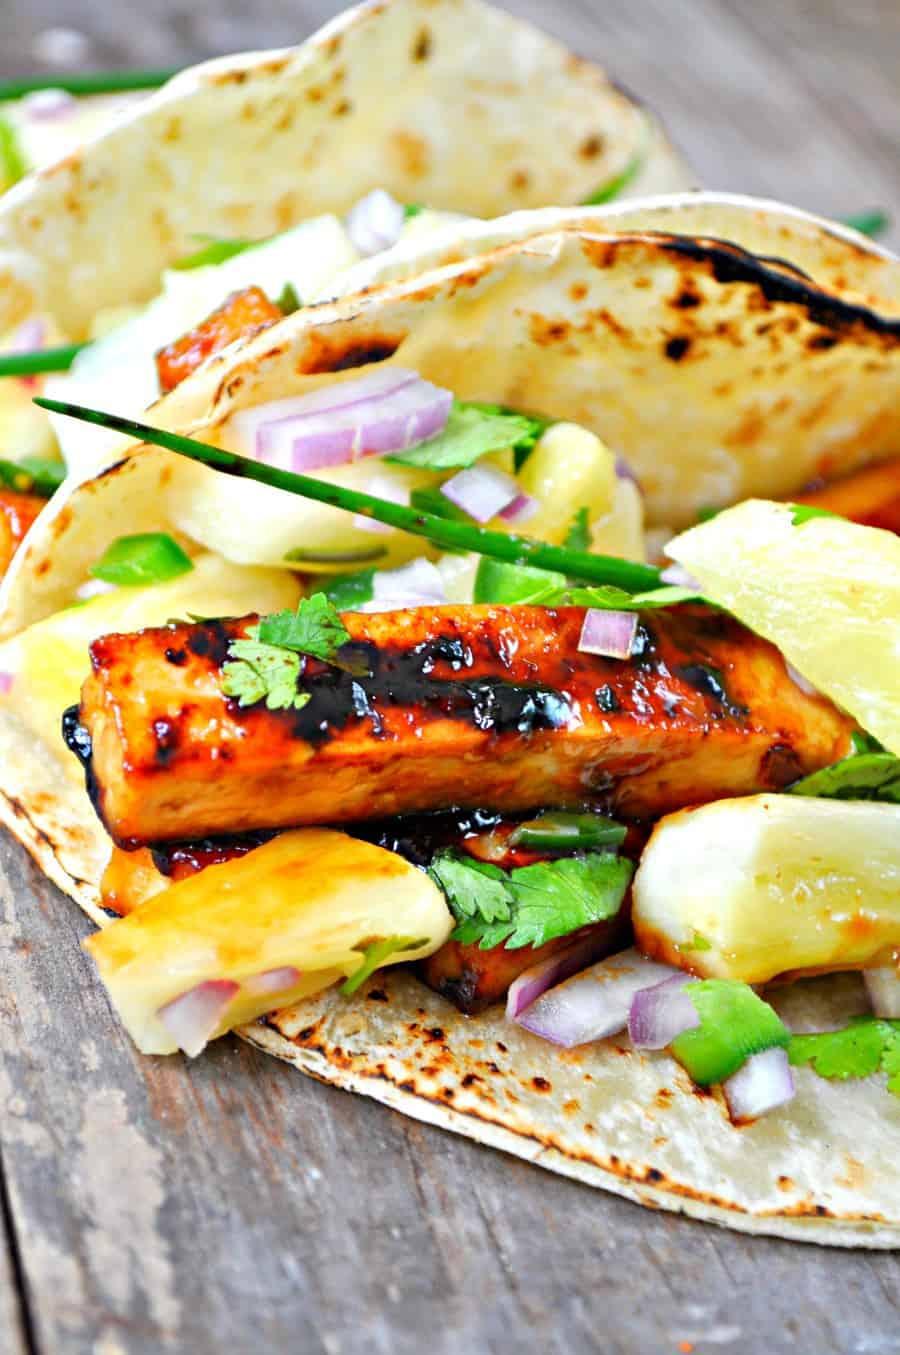 #Vegetarian taco filling